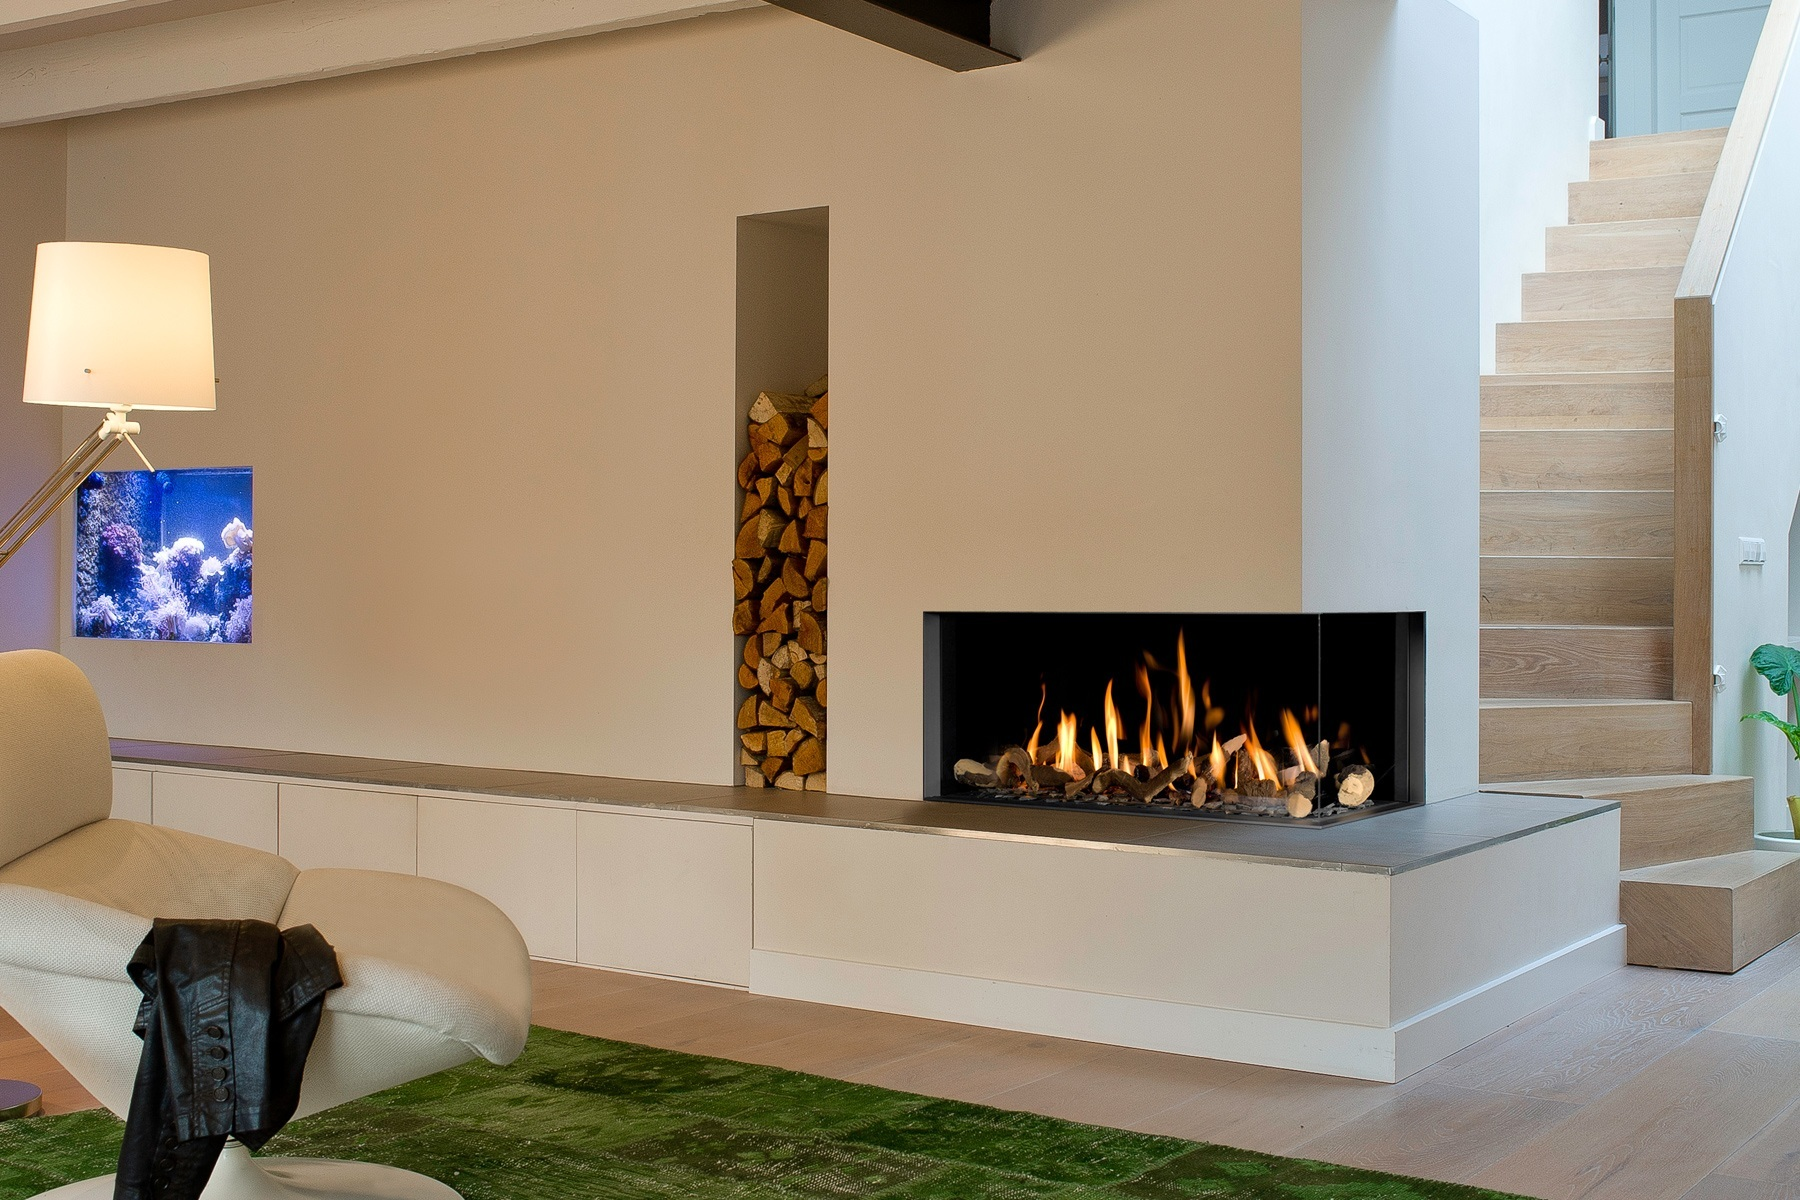 prix cheminee gaz cheminee gaz traversante po les inserts chemin es bois. Black Bedroom Furniture Sets. Home Design Ideas